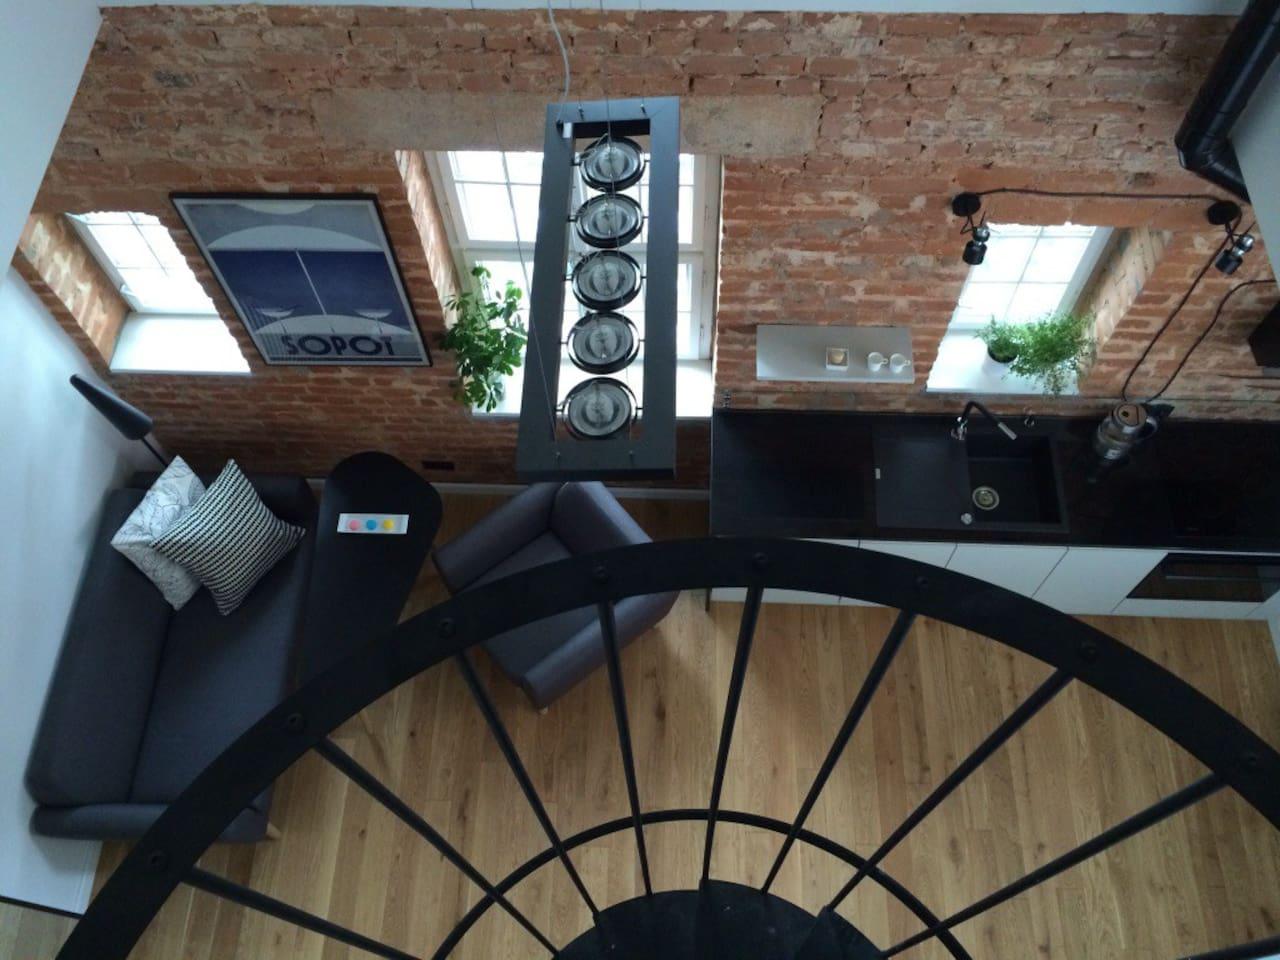 Living room with kitchen, oak floor, original wooden windows, exposed brick wall.